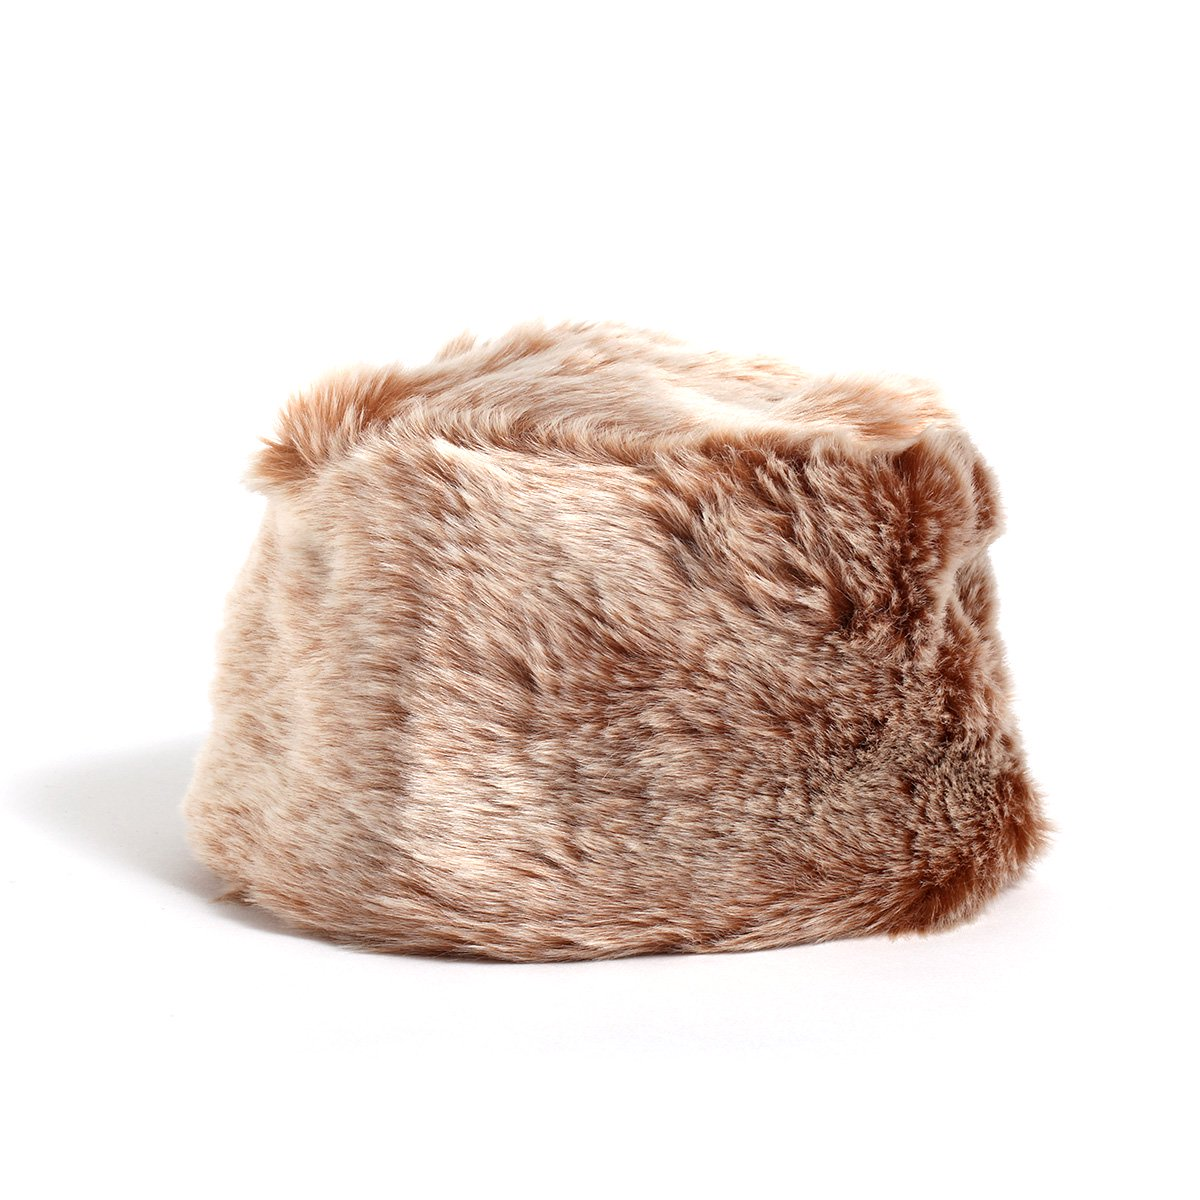 【KIDS】Kids Fur Russia Hat 詳細画像2